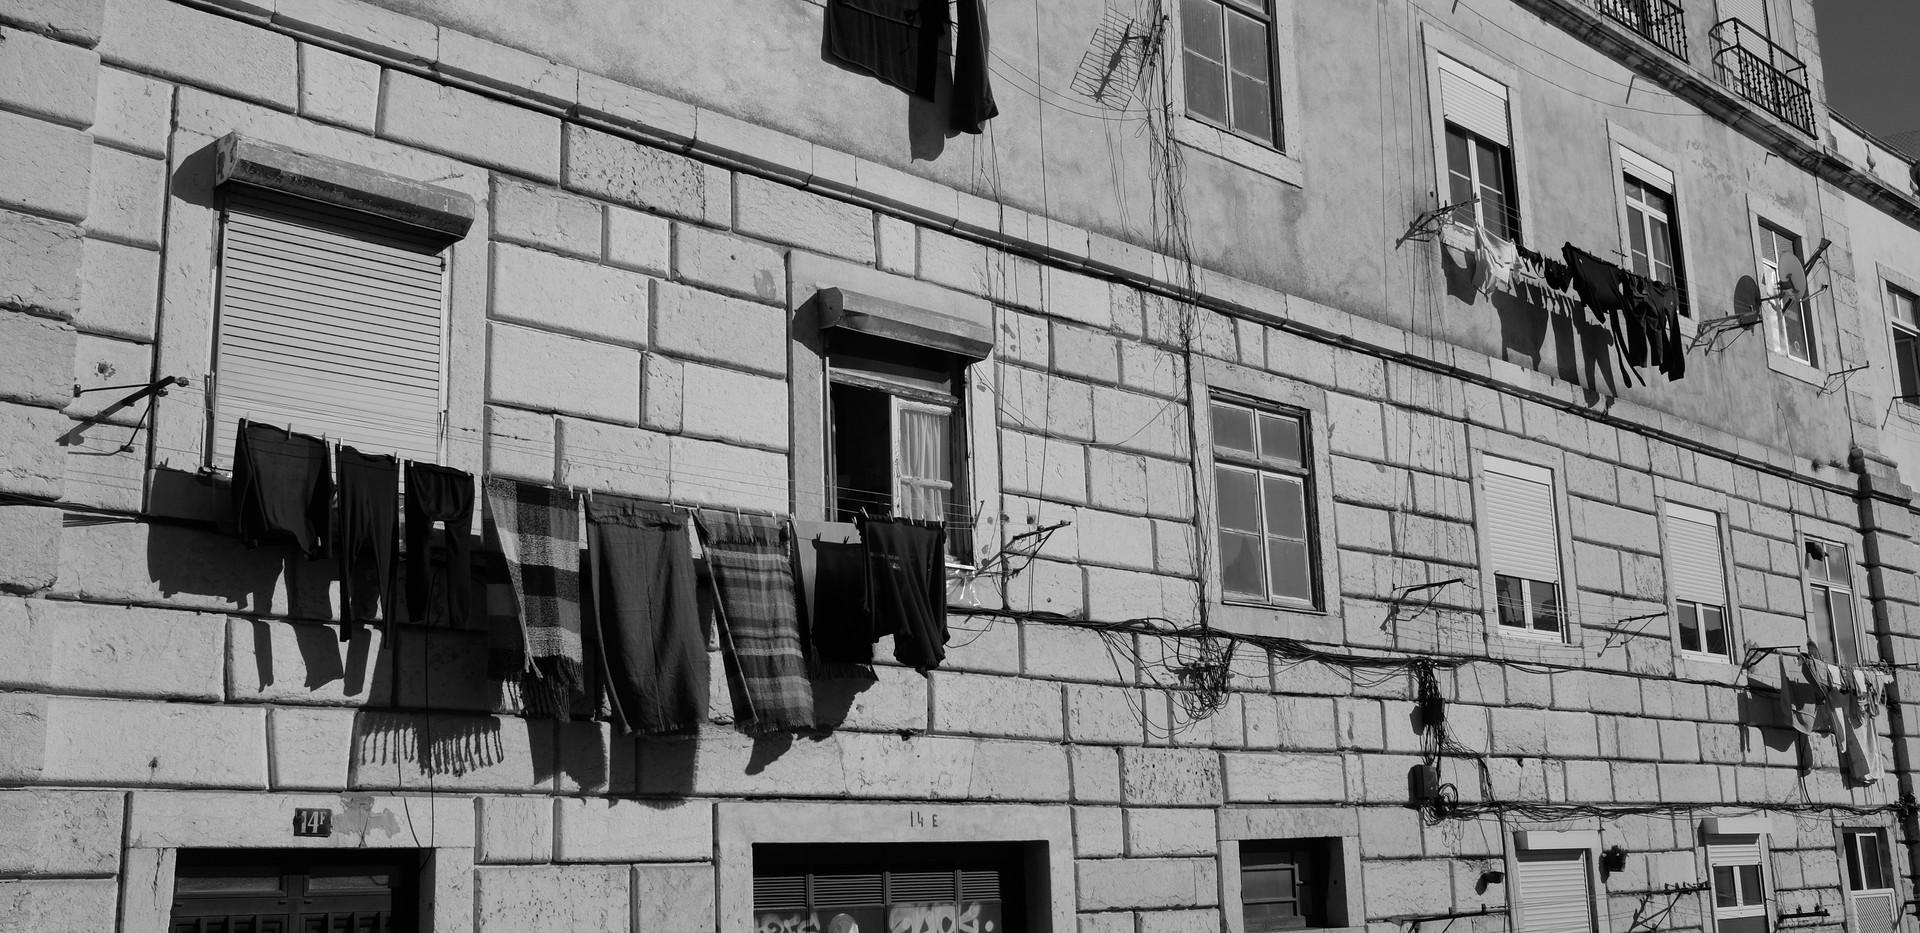 lisboa black and white